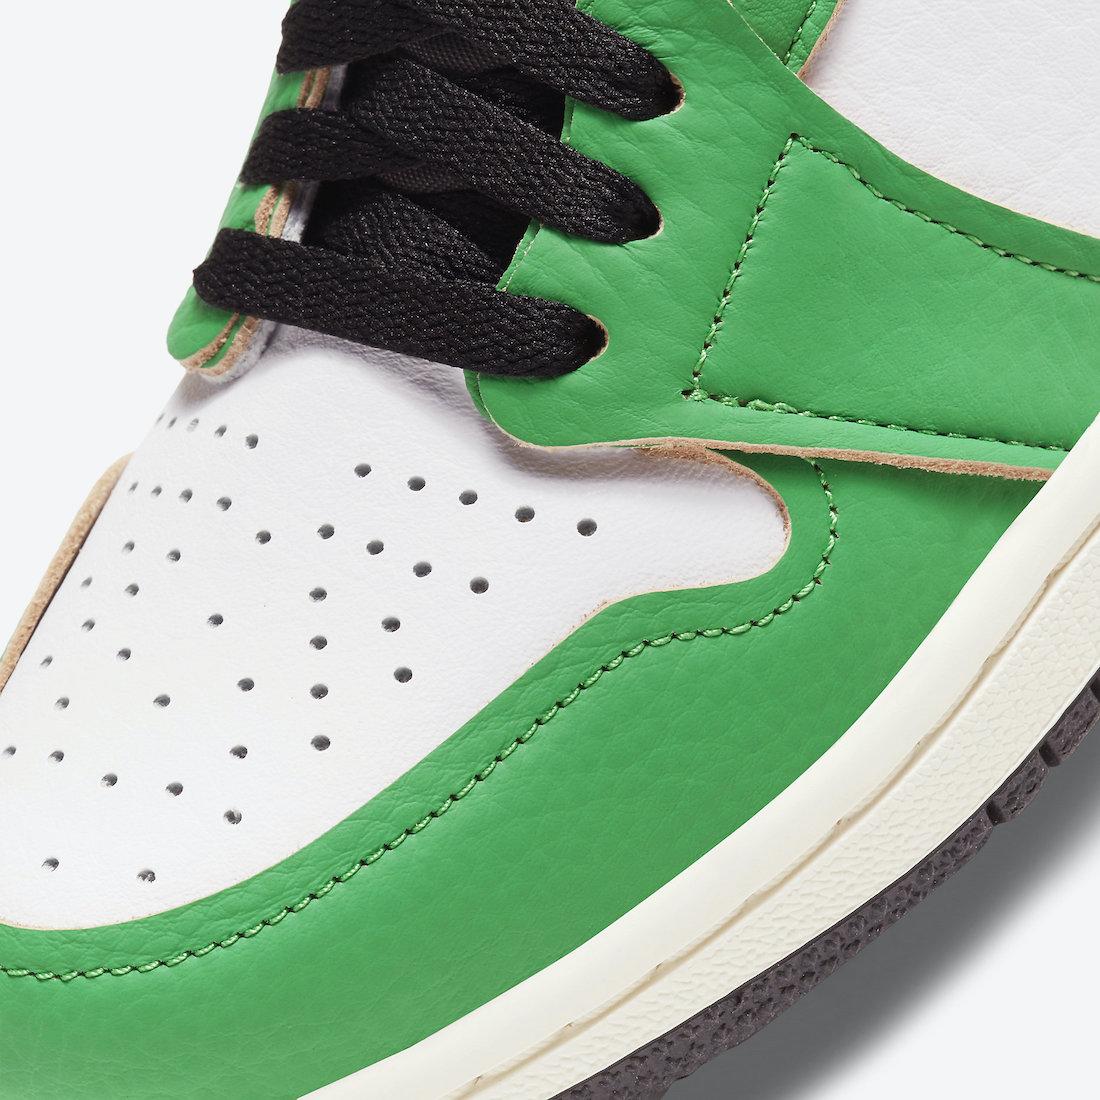 Air-Jordan-1-Lucky-Green-DB4612-300-Release-Date-Price-6